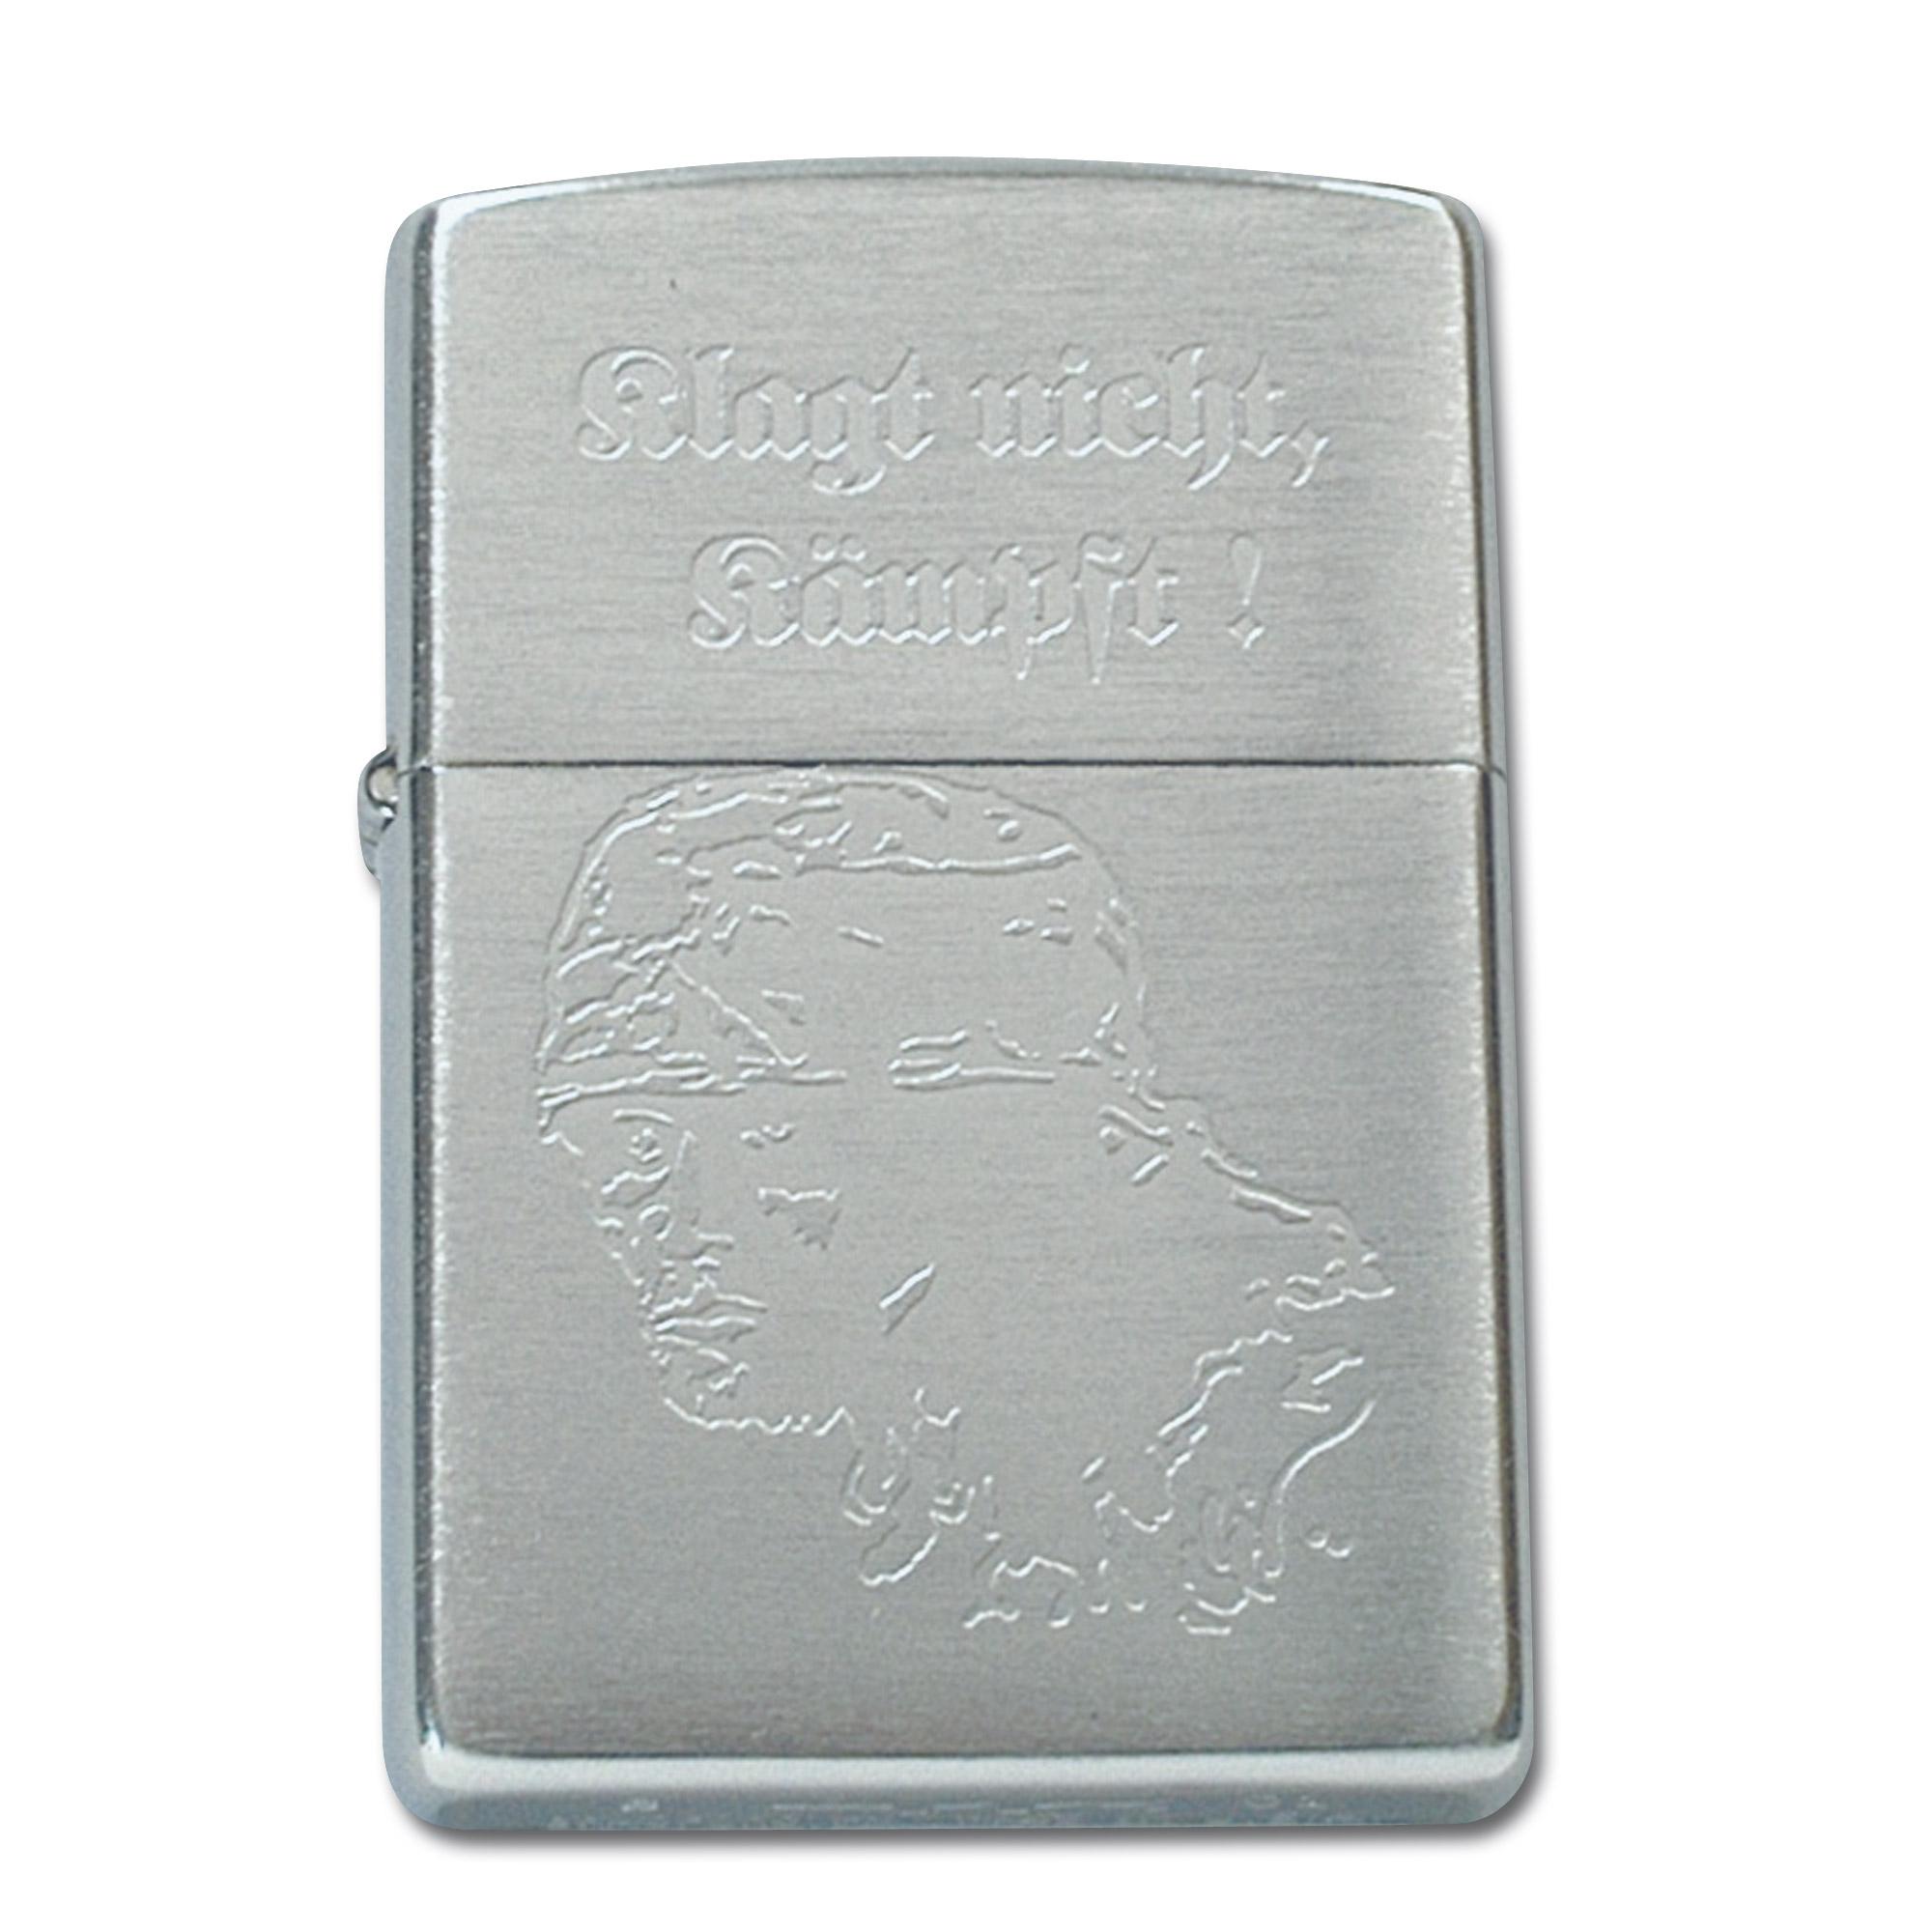 Accendino Zippo con incisione Klagt nicht Kämpft argento